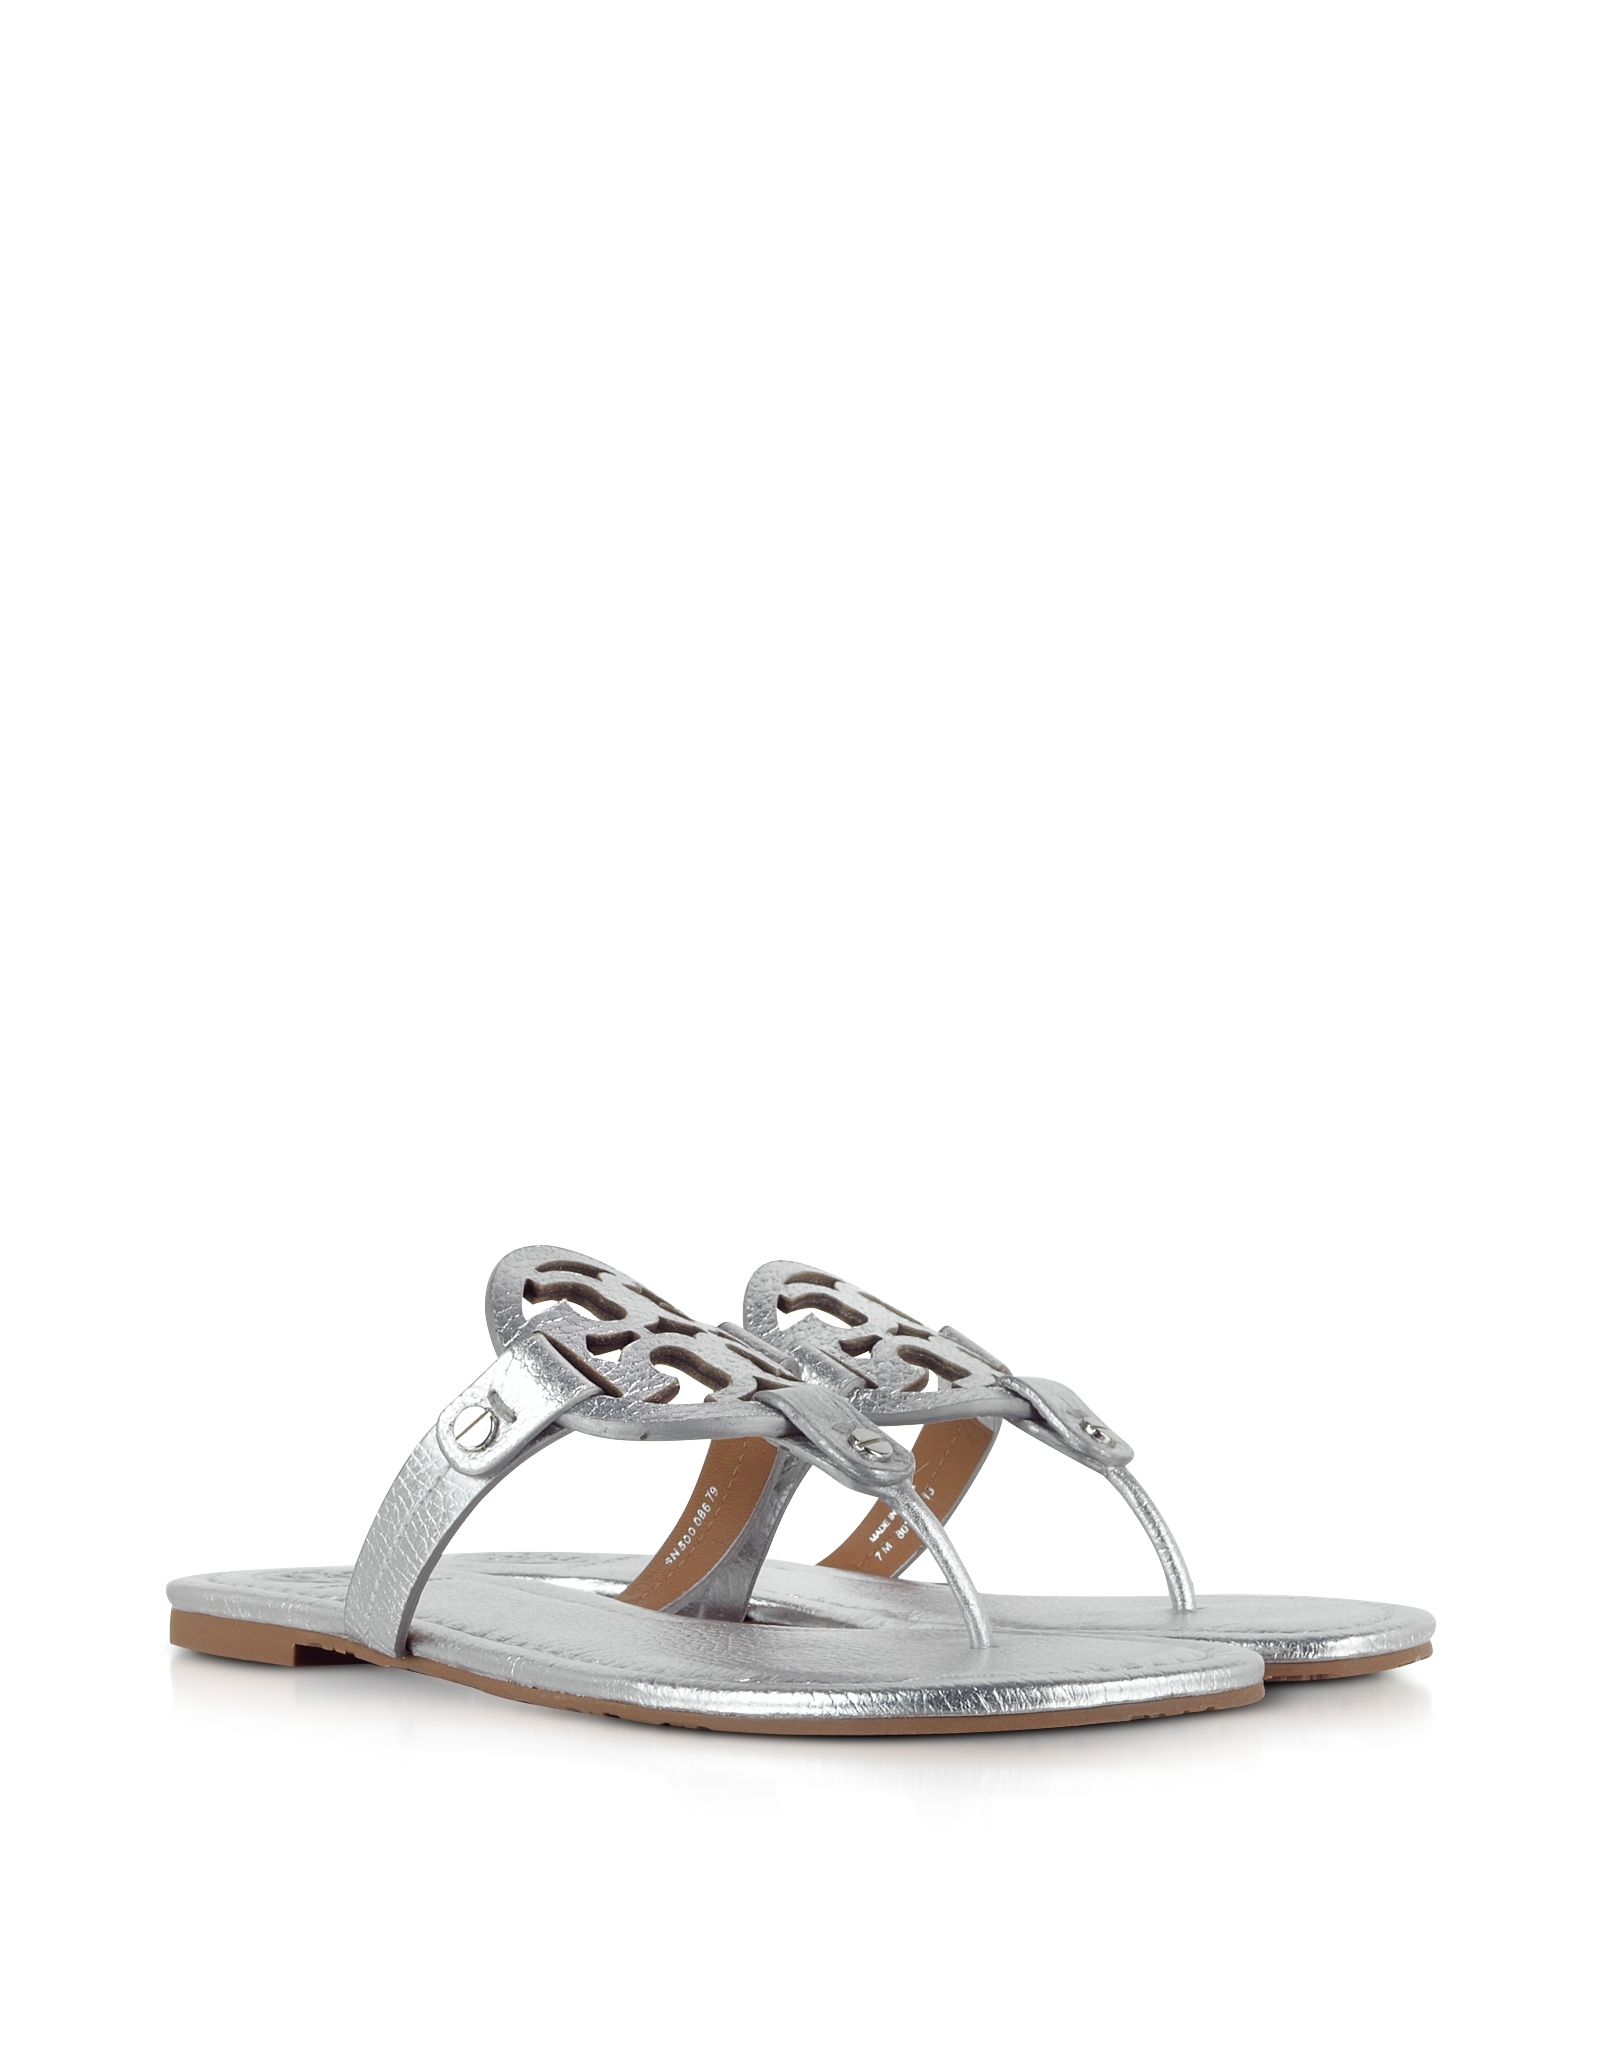 35fc830767ec6 Lyst - Tory Burch Miller Metallic Silver Leather Sandal in Metallic